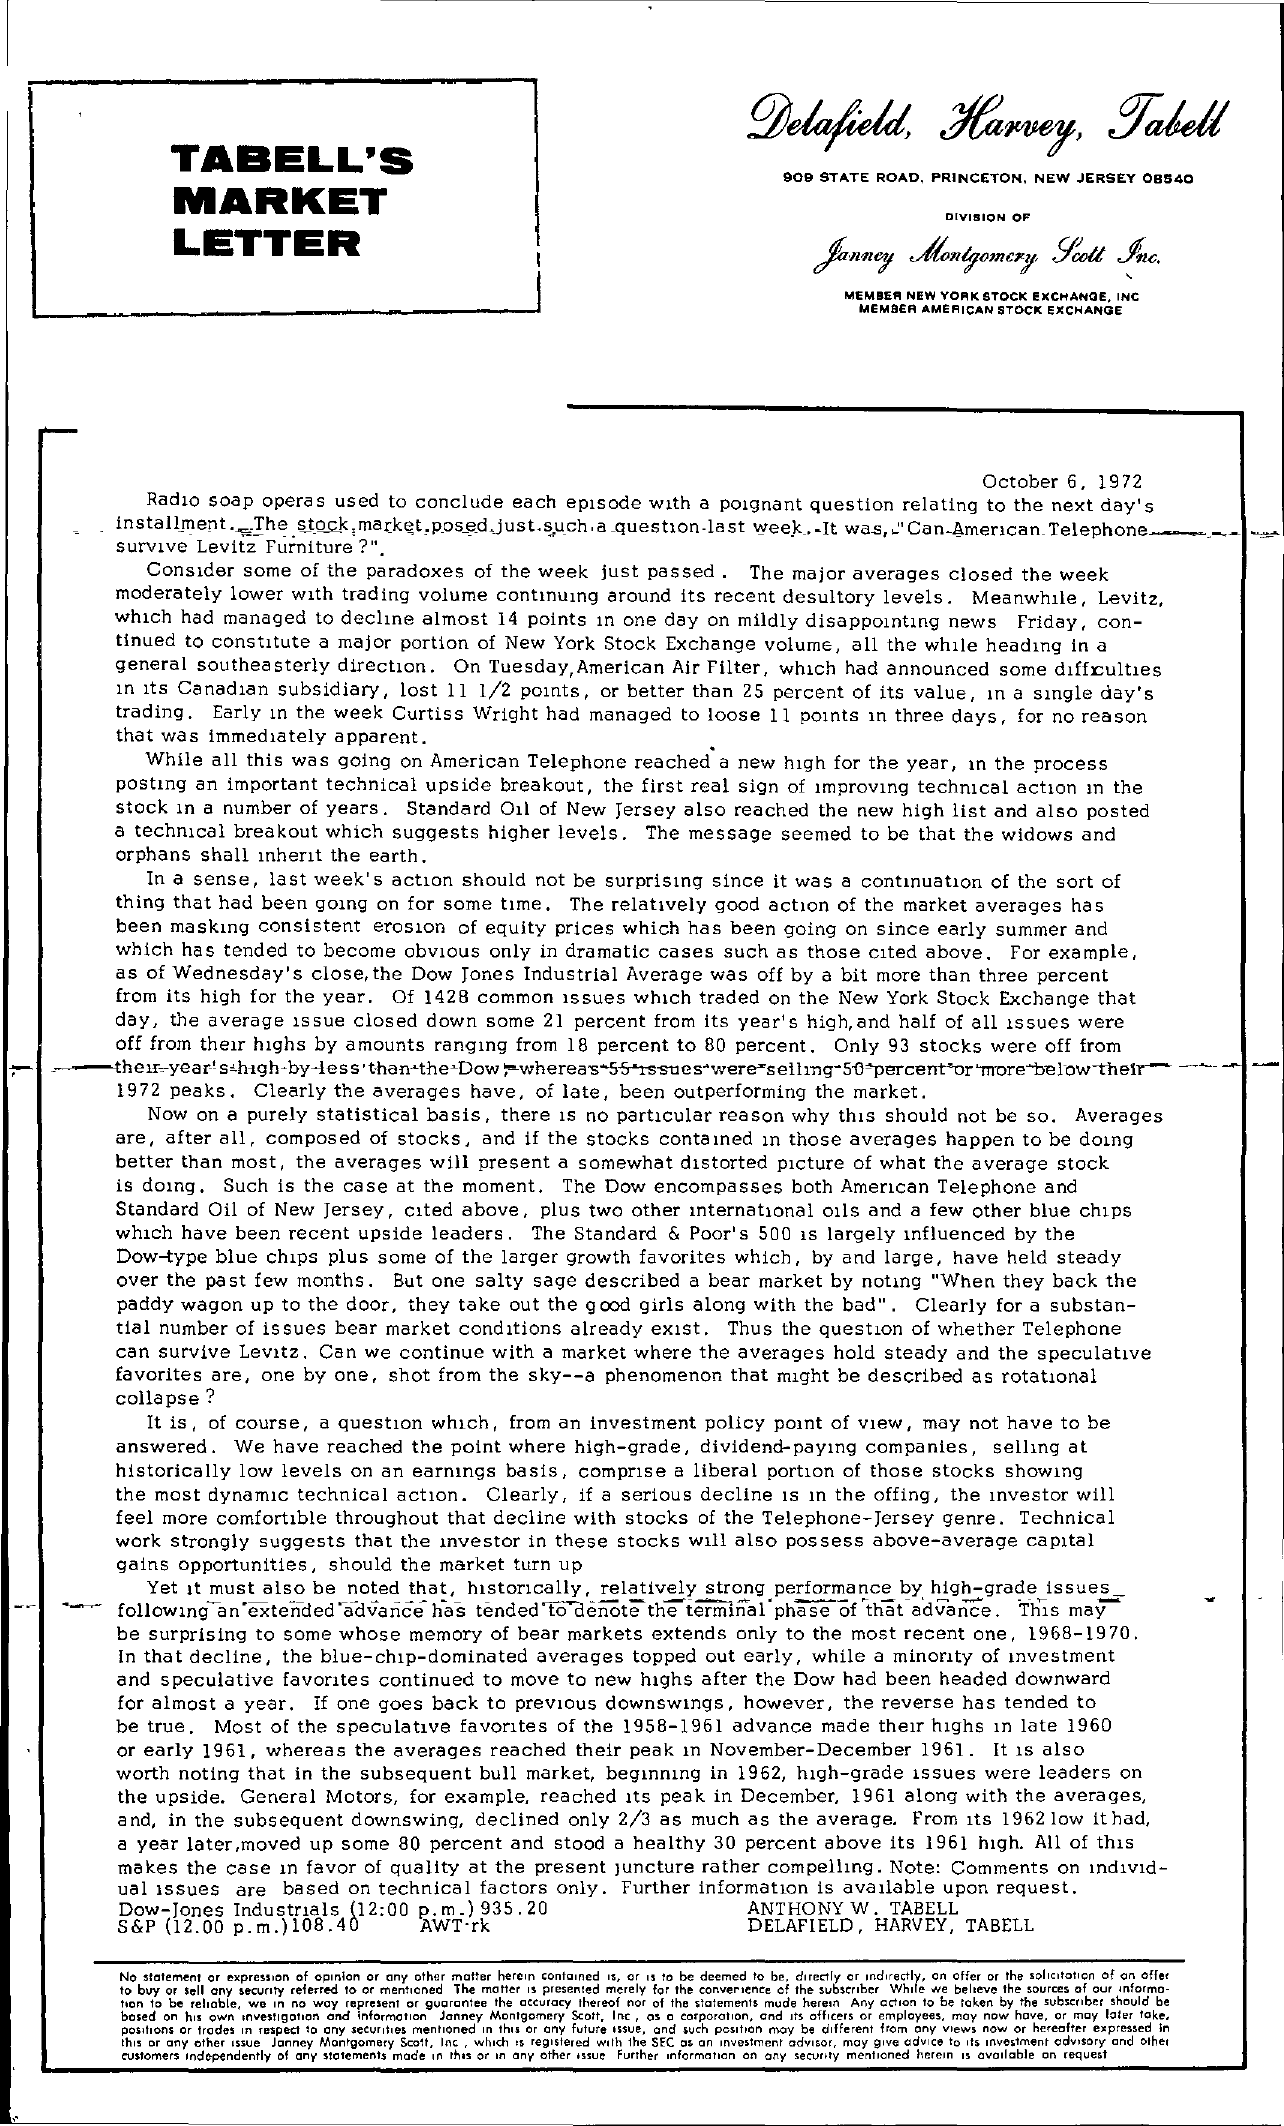 Tabell's Market Letter - October 06, 1972